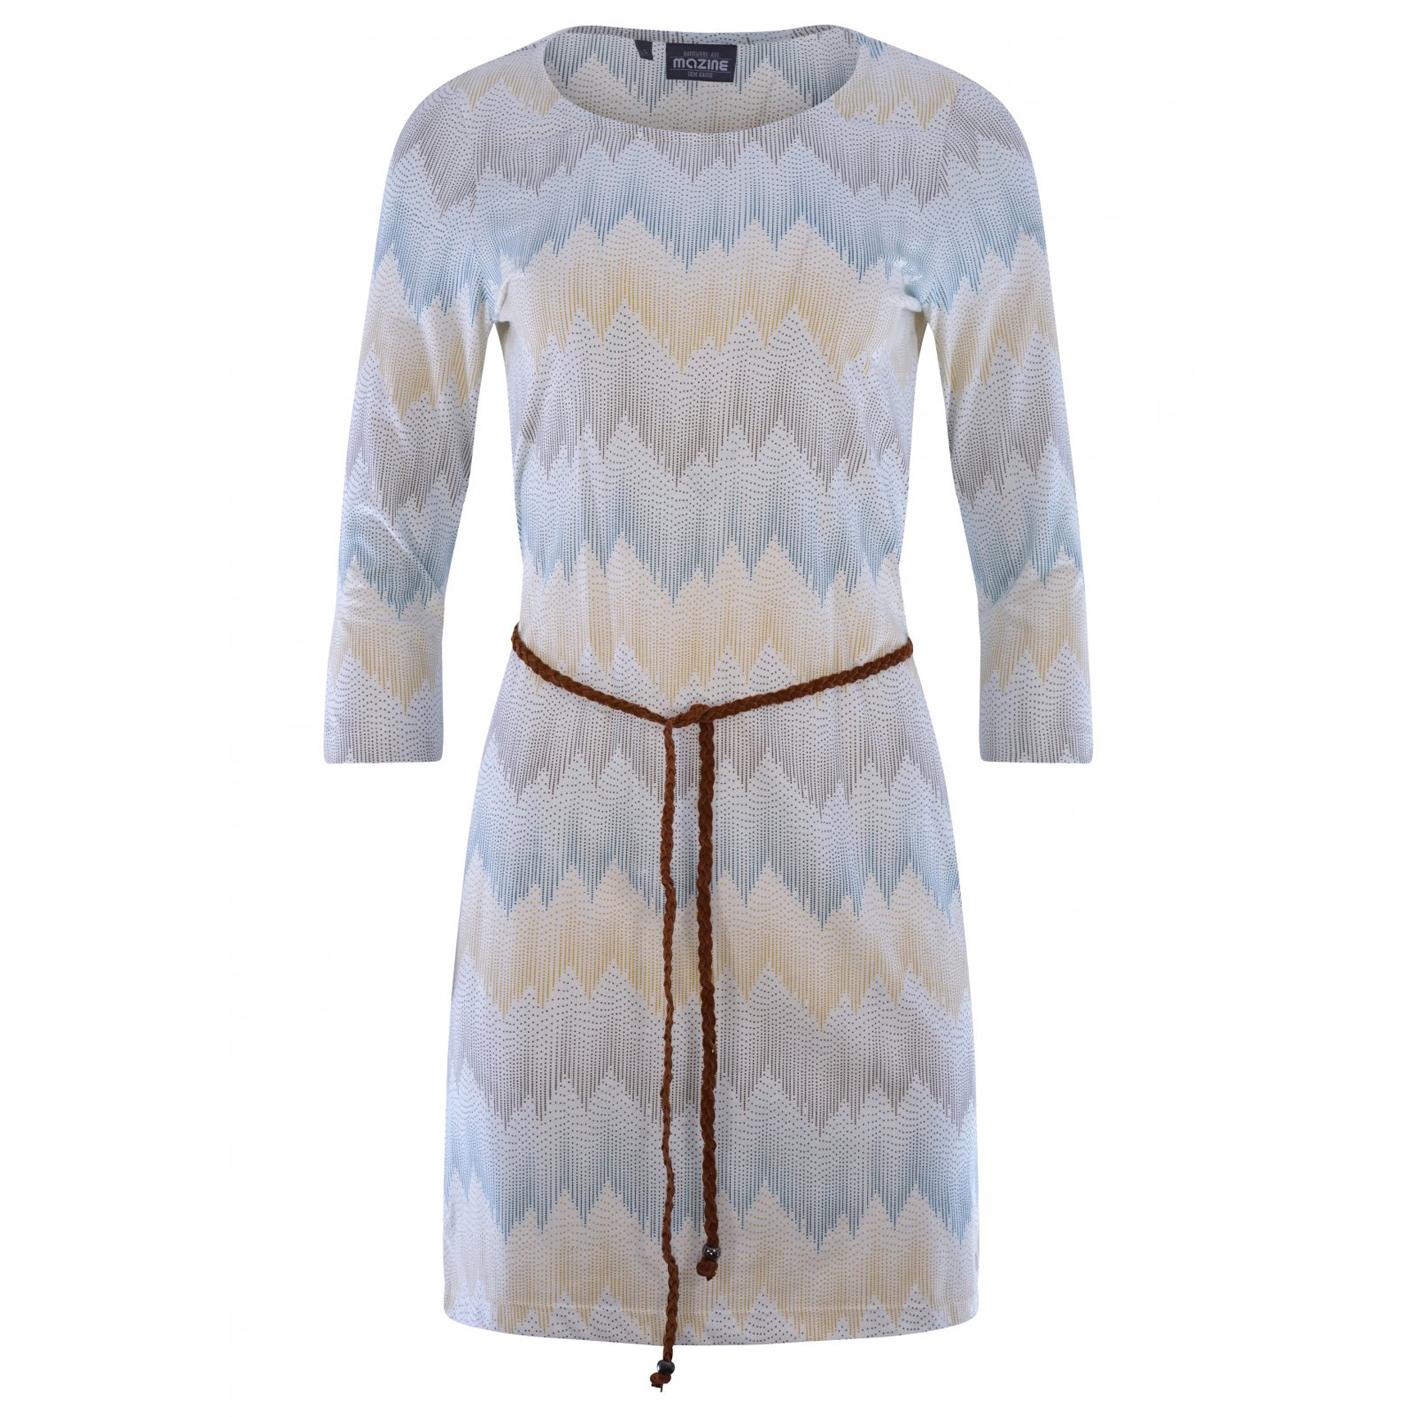 Mazine Lotte Dress